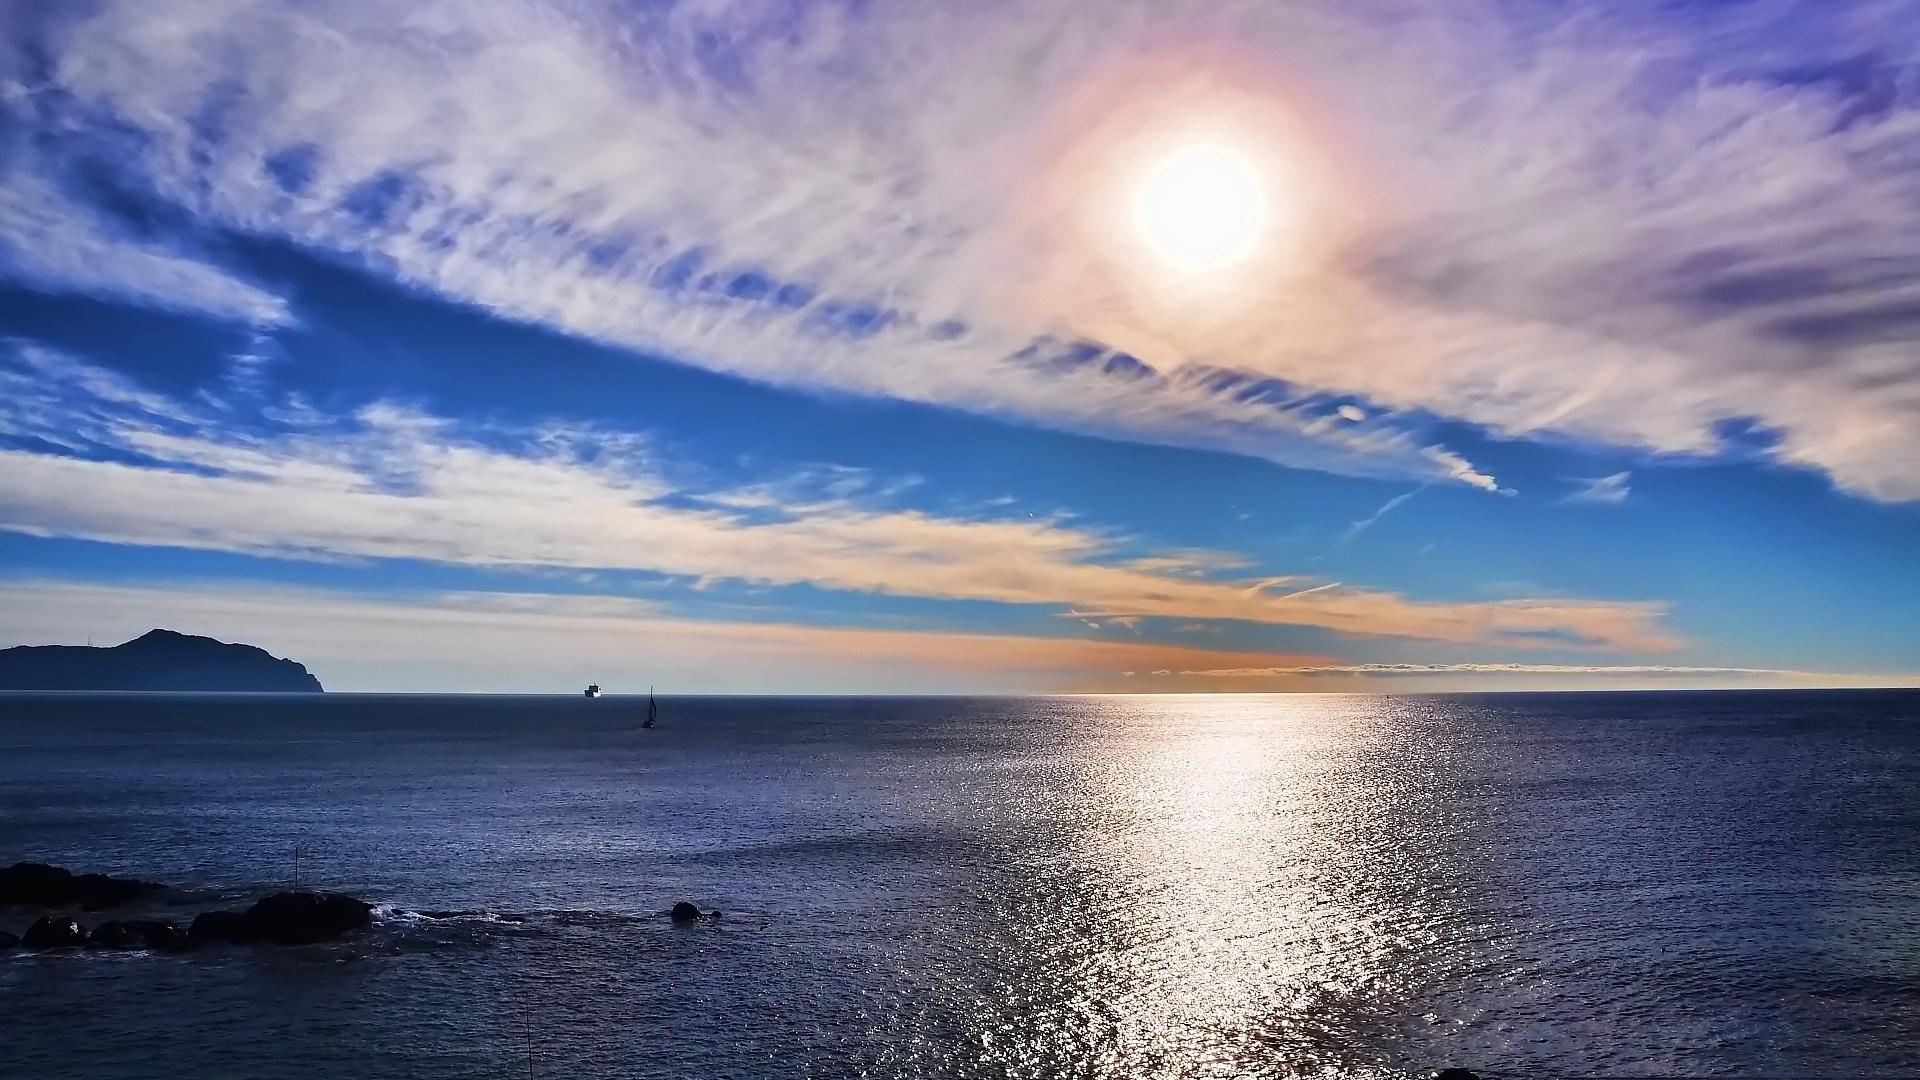 ... Seascape Pictures ...